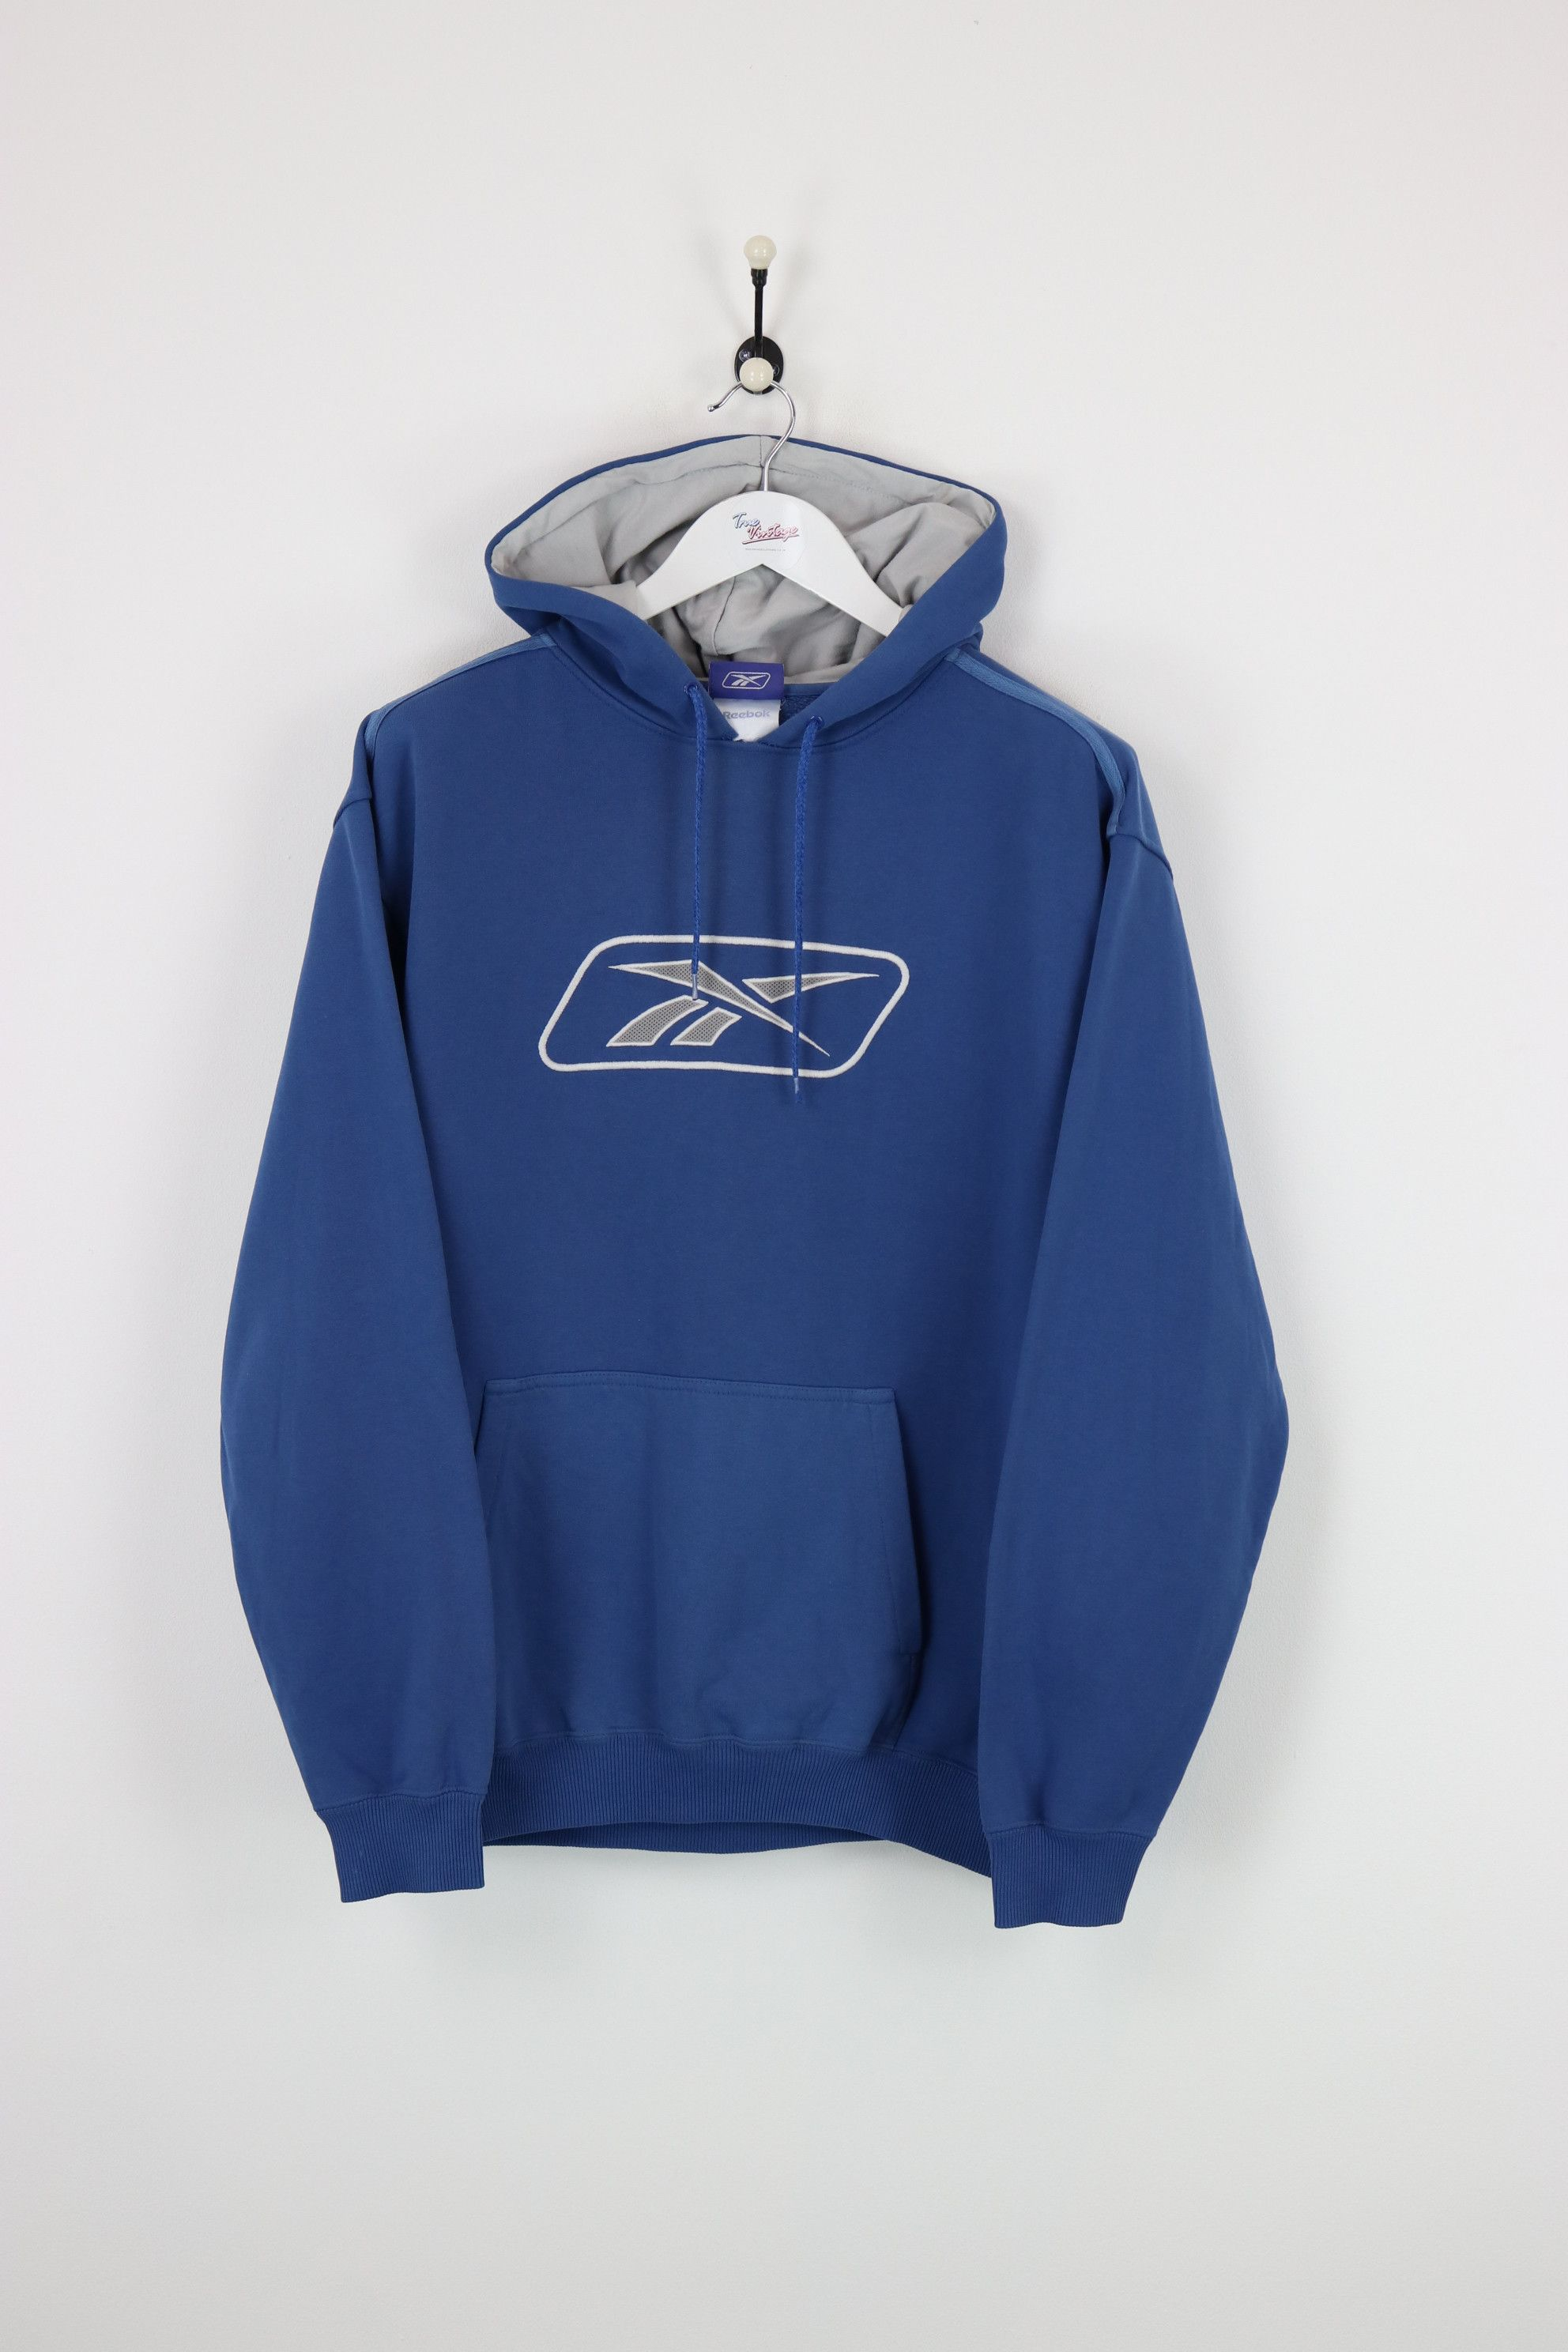 Vintage Reebok Sweatshirt / Reebok Jacket / Reebok Sweater / Reebok Sweatshirt / Sportwear / Hip Hop Hn2tzWS5Q